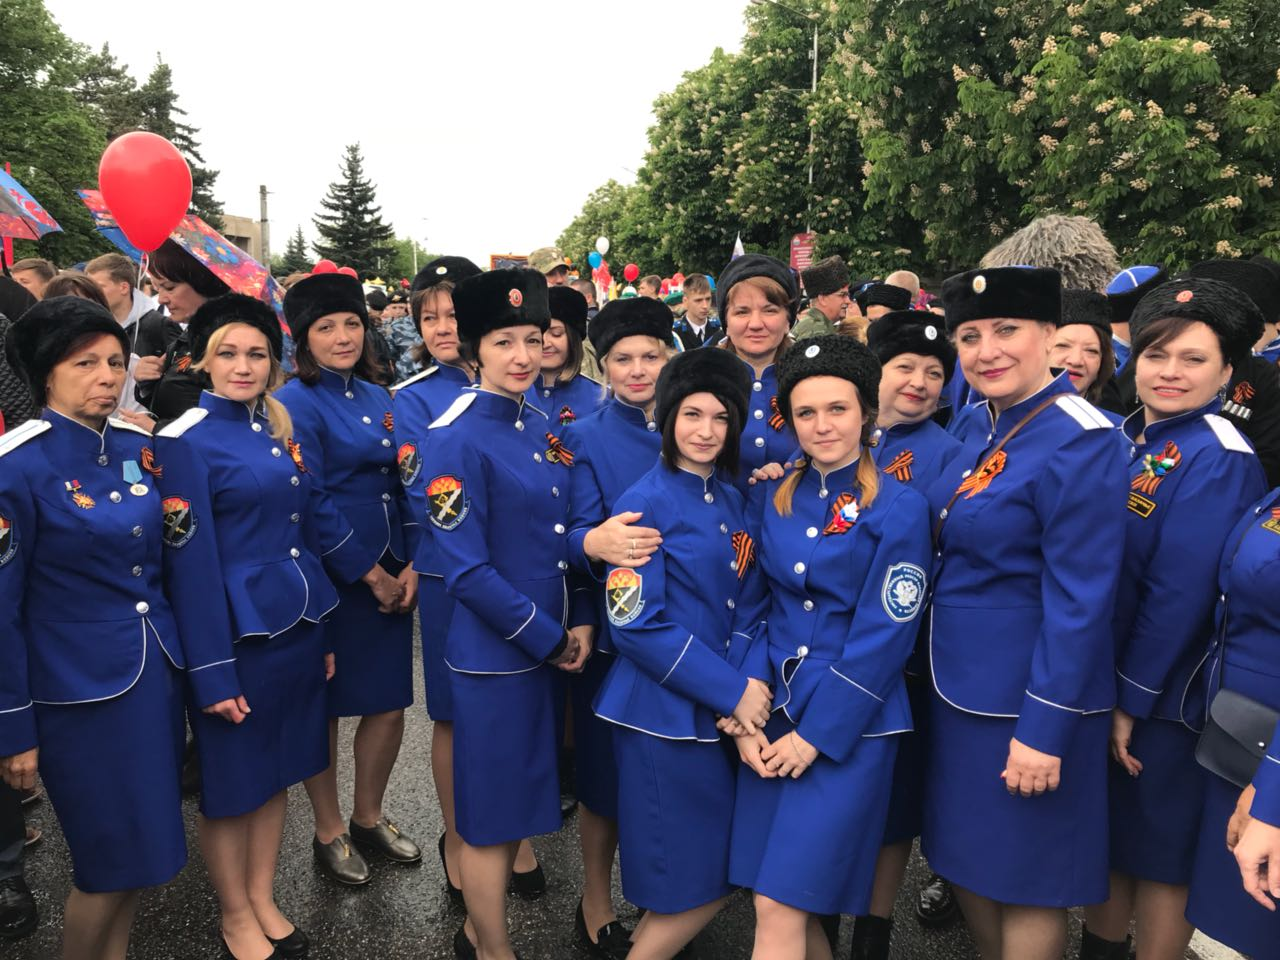 День Победы, парад 9 мая 2018